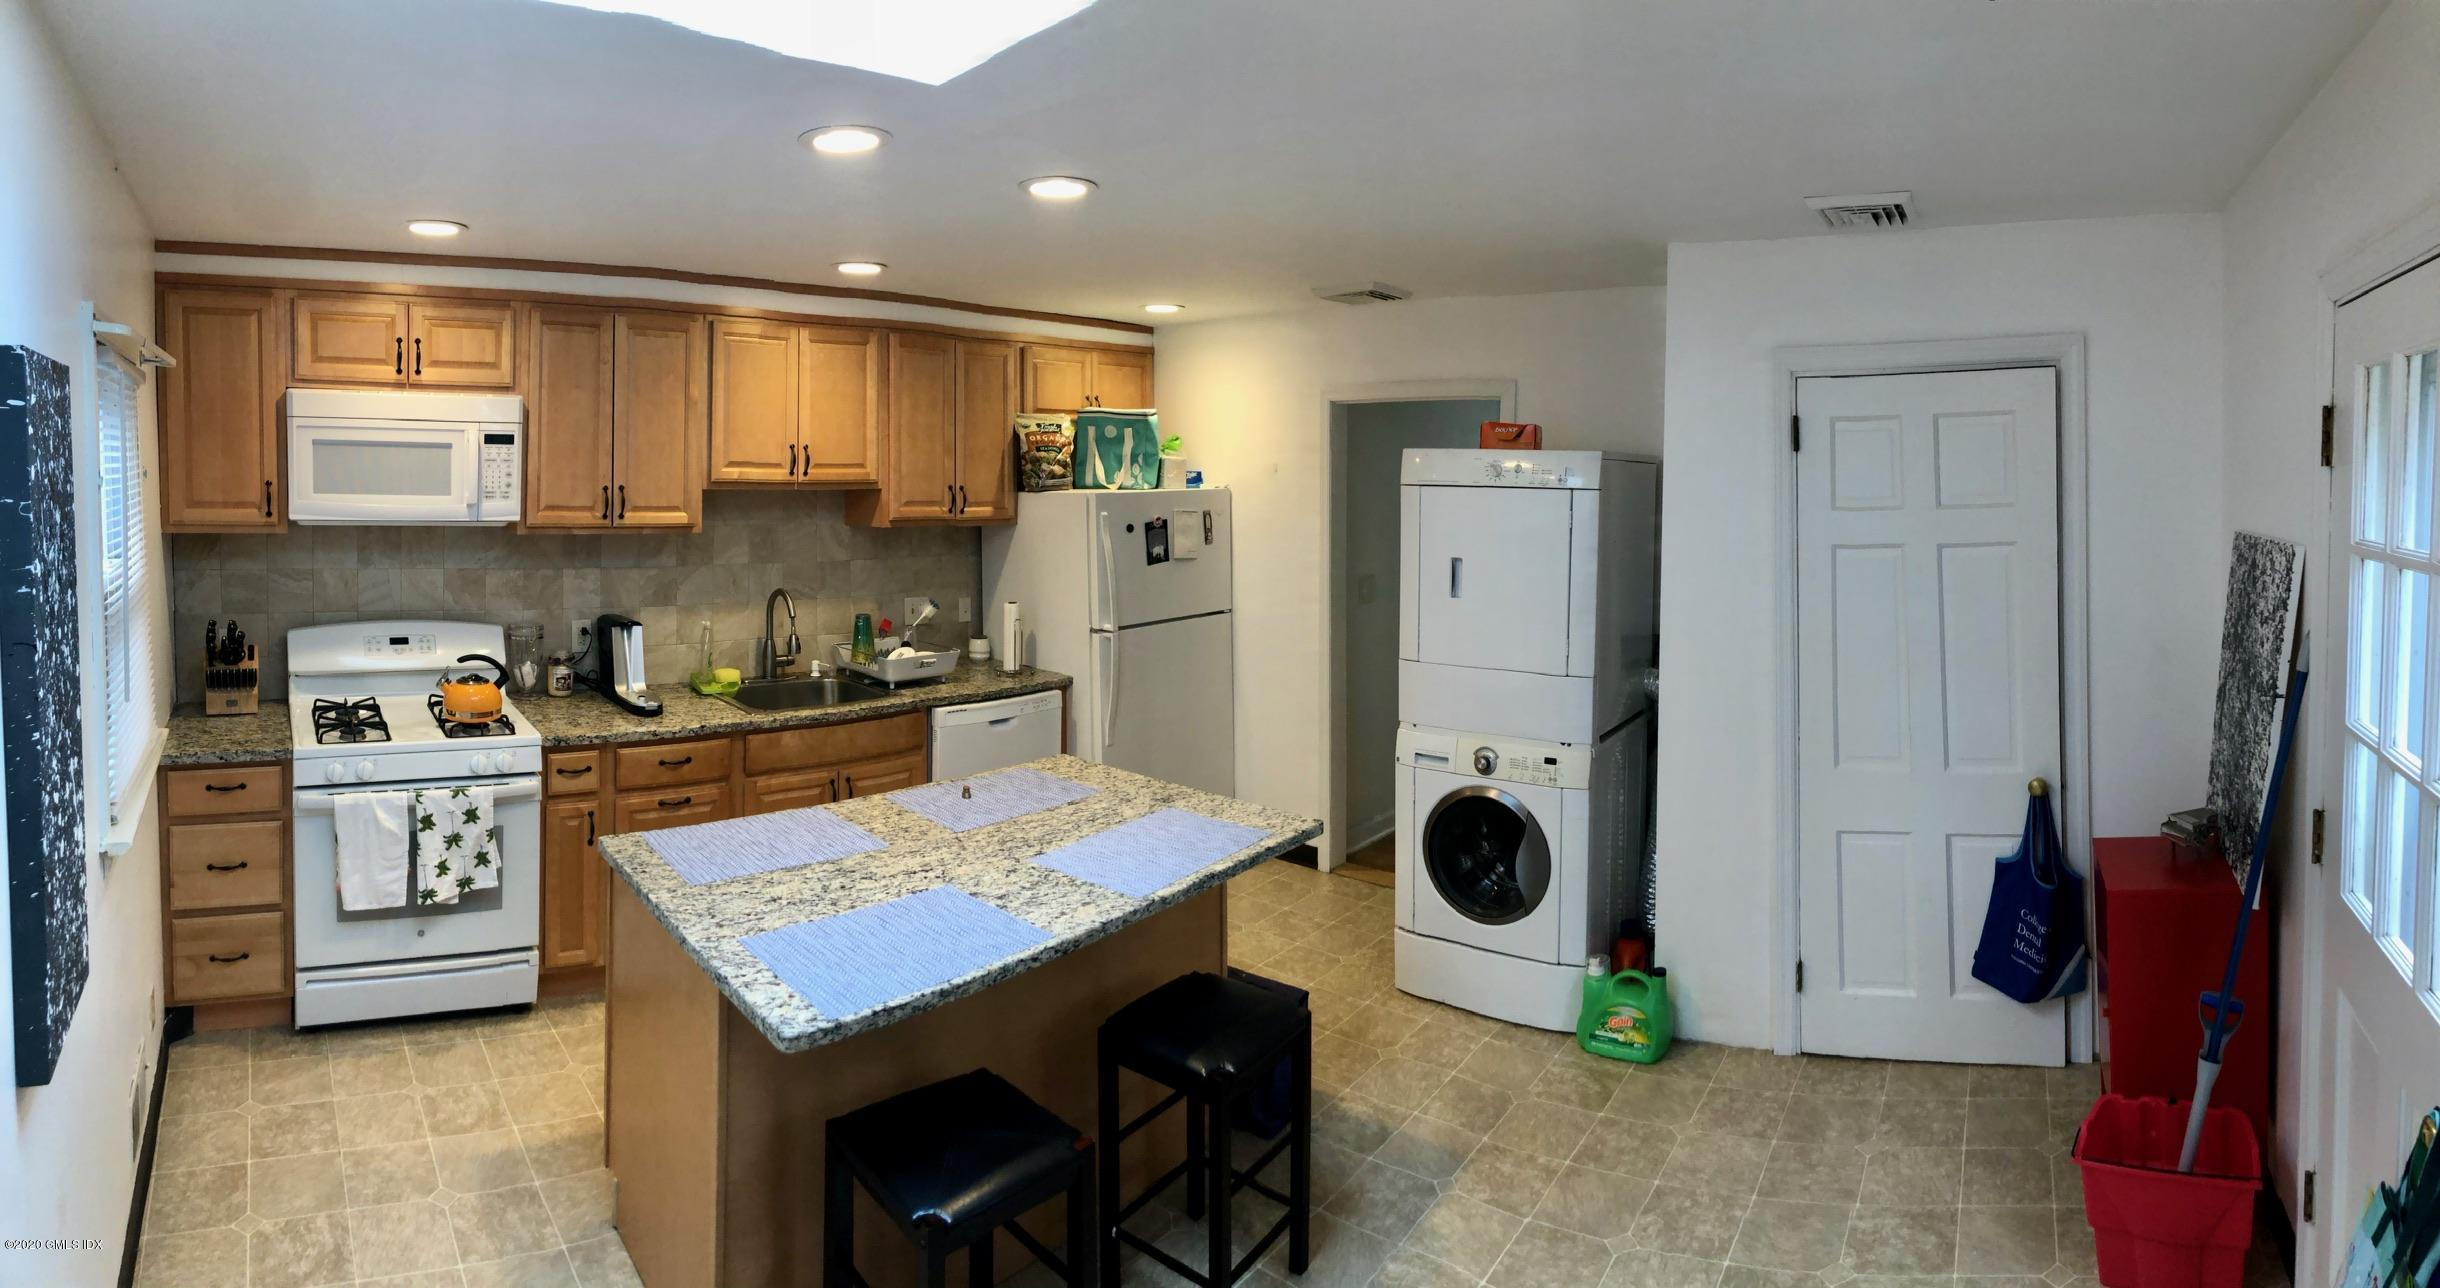 16 Concord Street,Greenwich,Connecticut 06831,Concord,108566